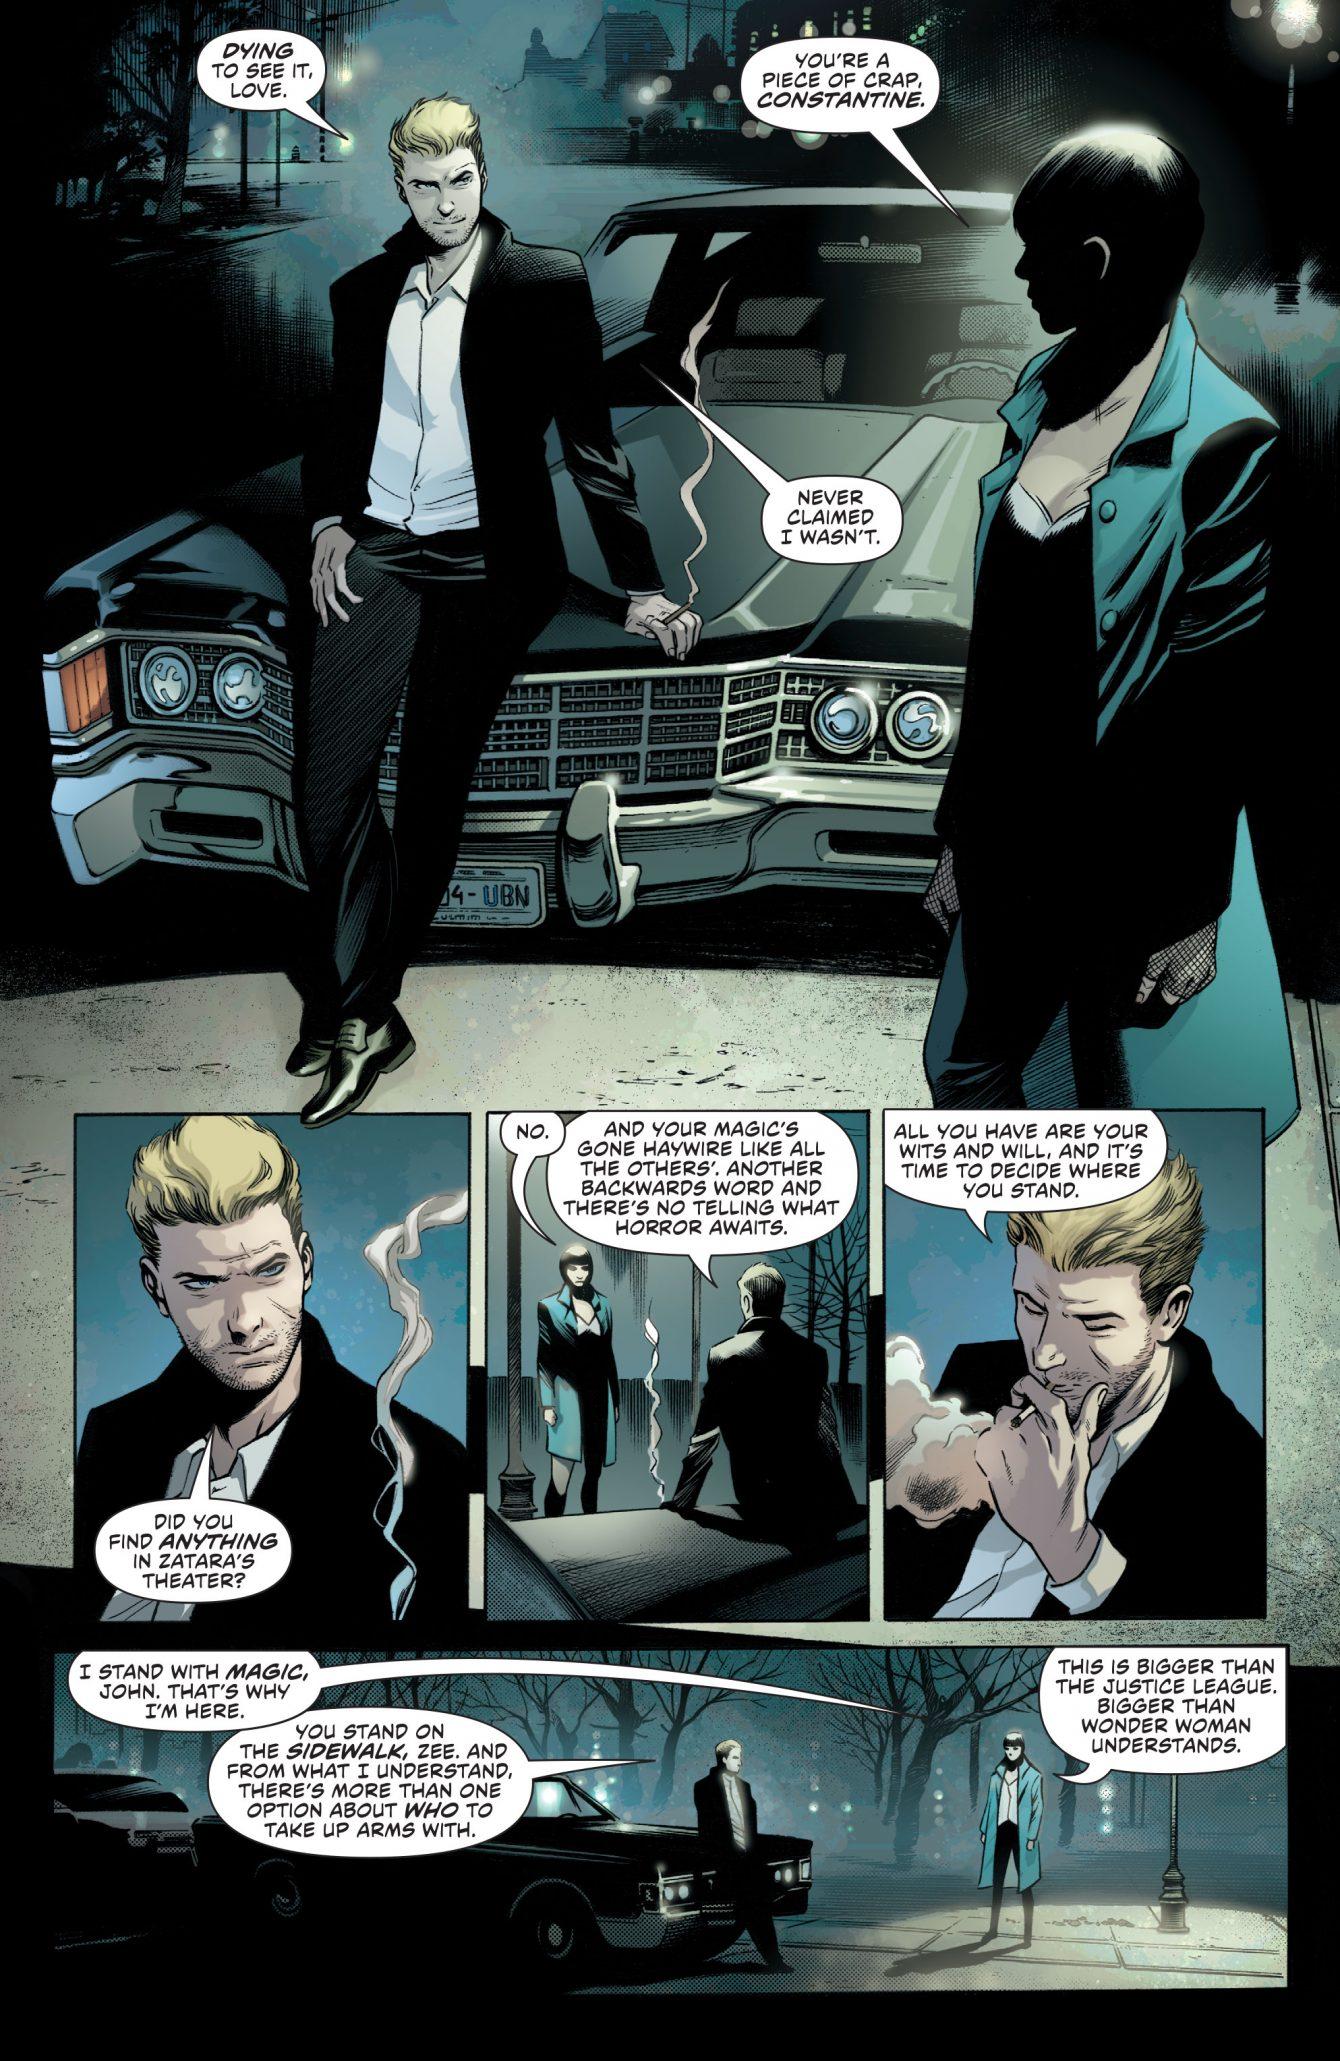 Justice League Dark #1 Preview Page - DC Comics